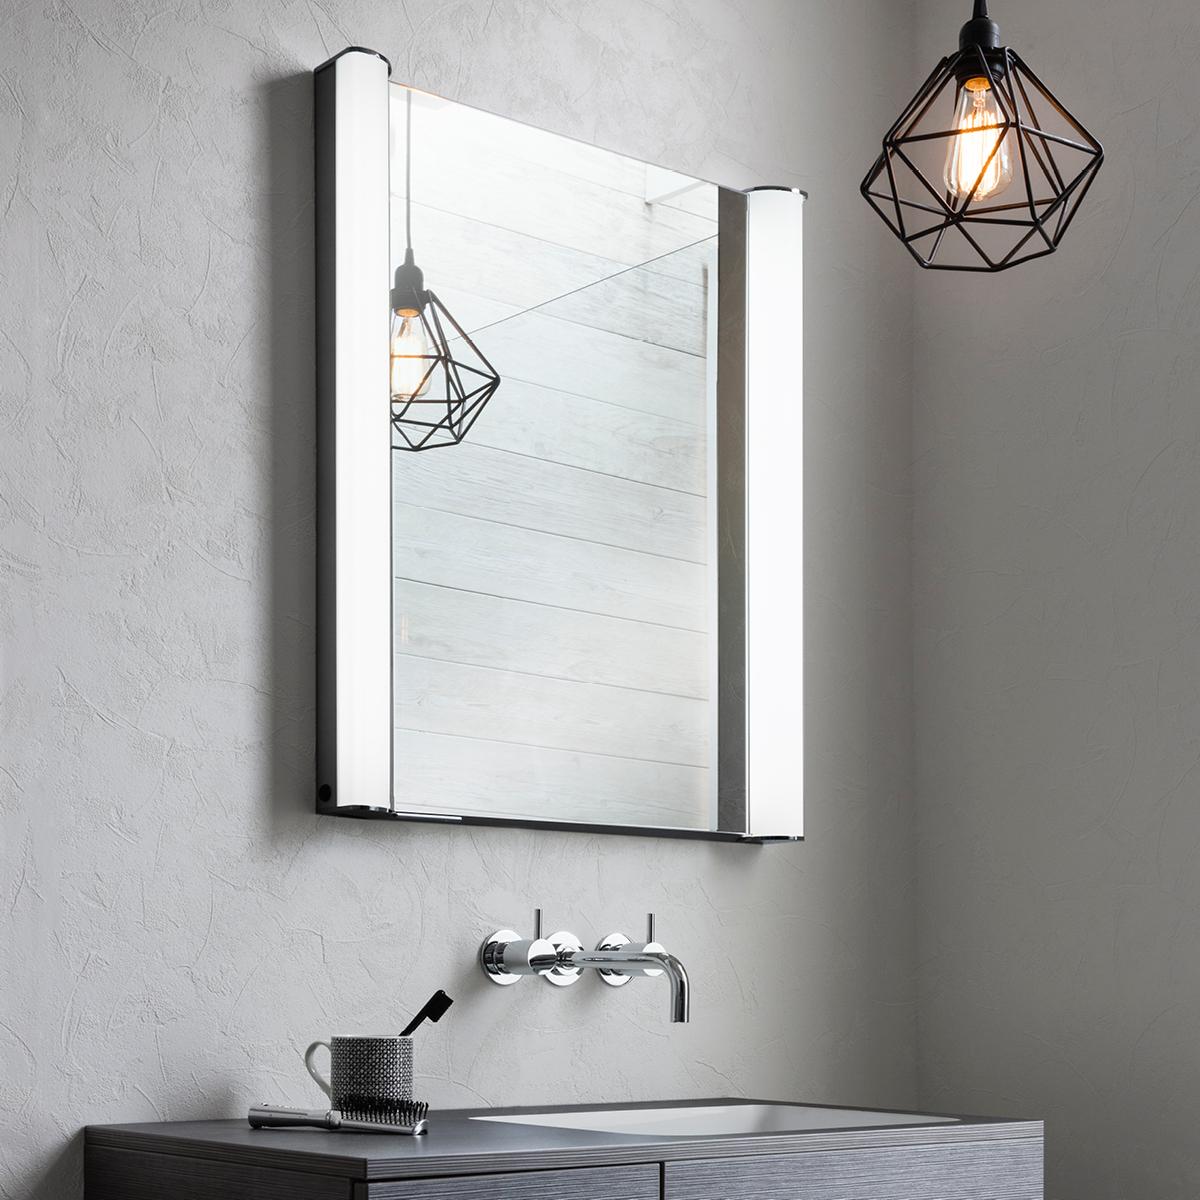 Duo 600 Illuminated Mirrored Cabinet in Duo | Luxury ...